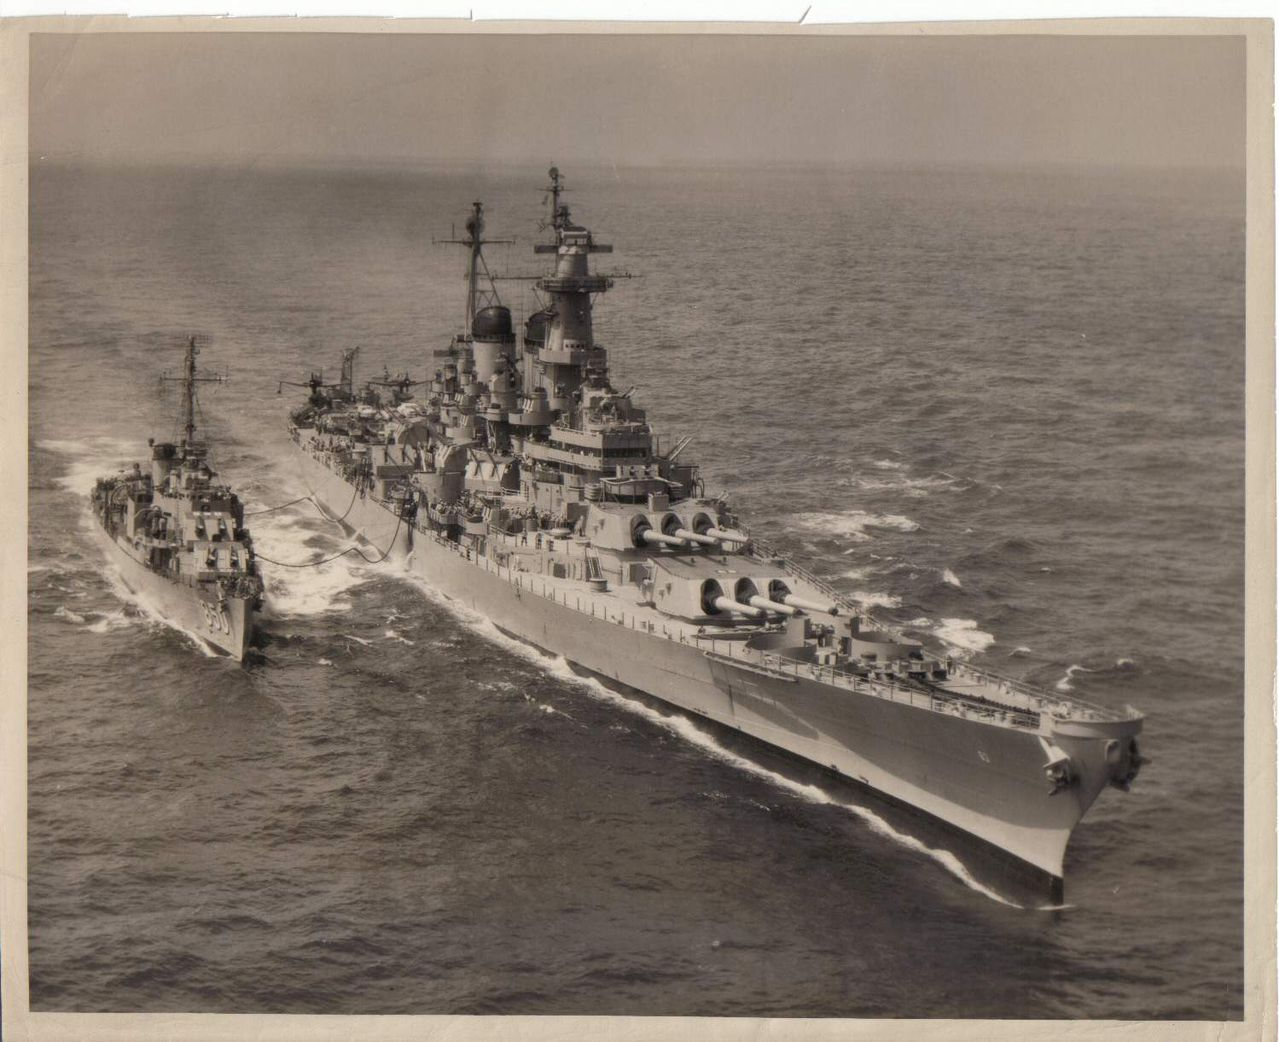 Battleship U.S.S. Missouri (WWII) - Σελίδα 2 01630036